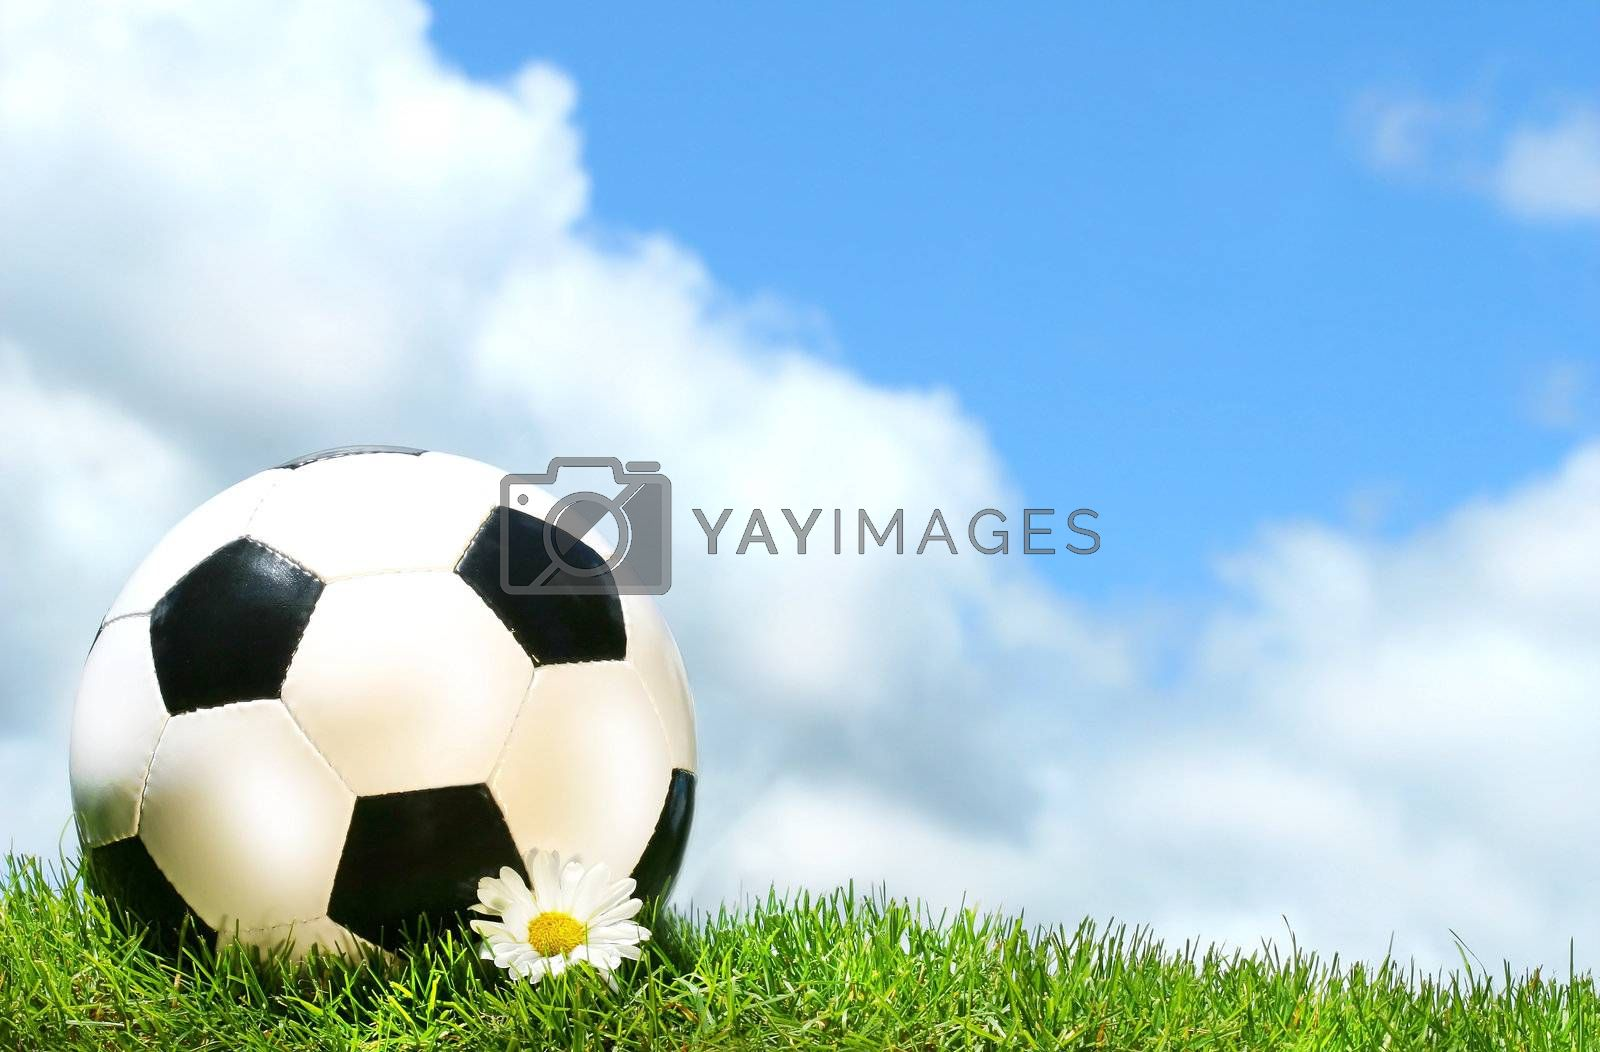 Soccerball with daisy against a blue sky by Sandralise